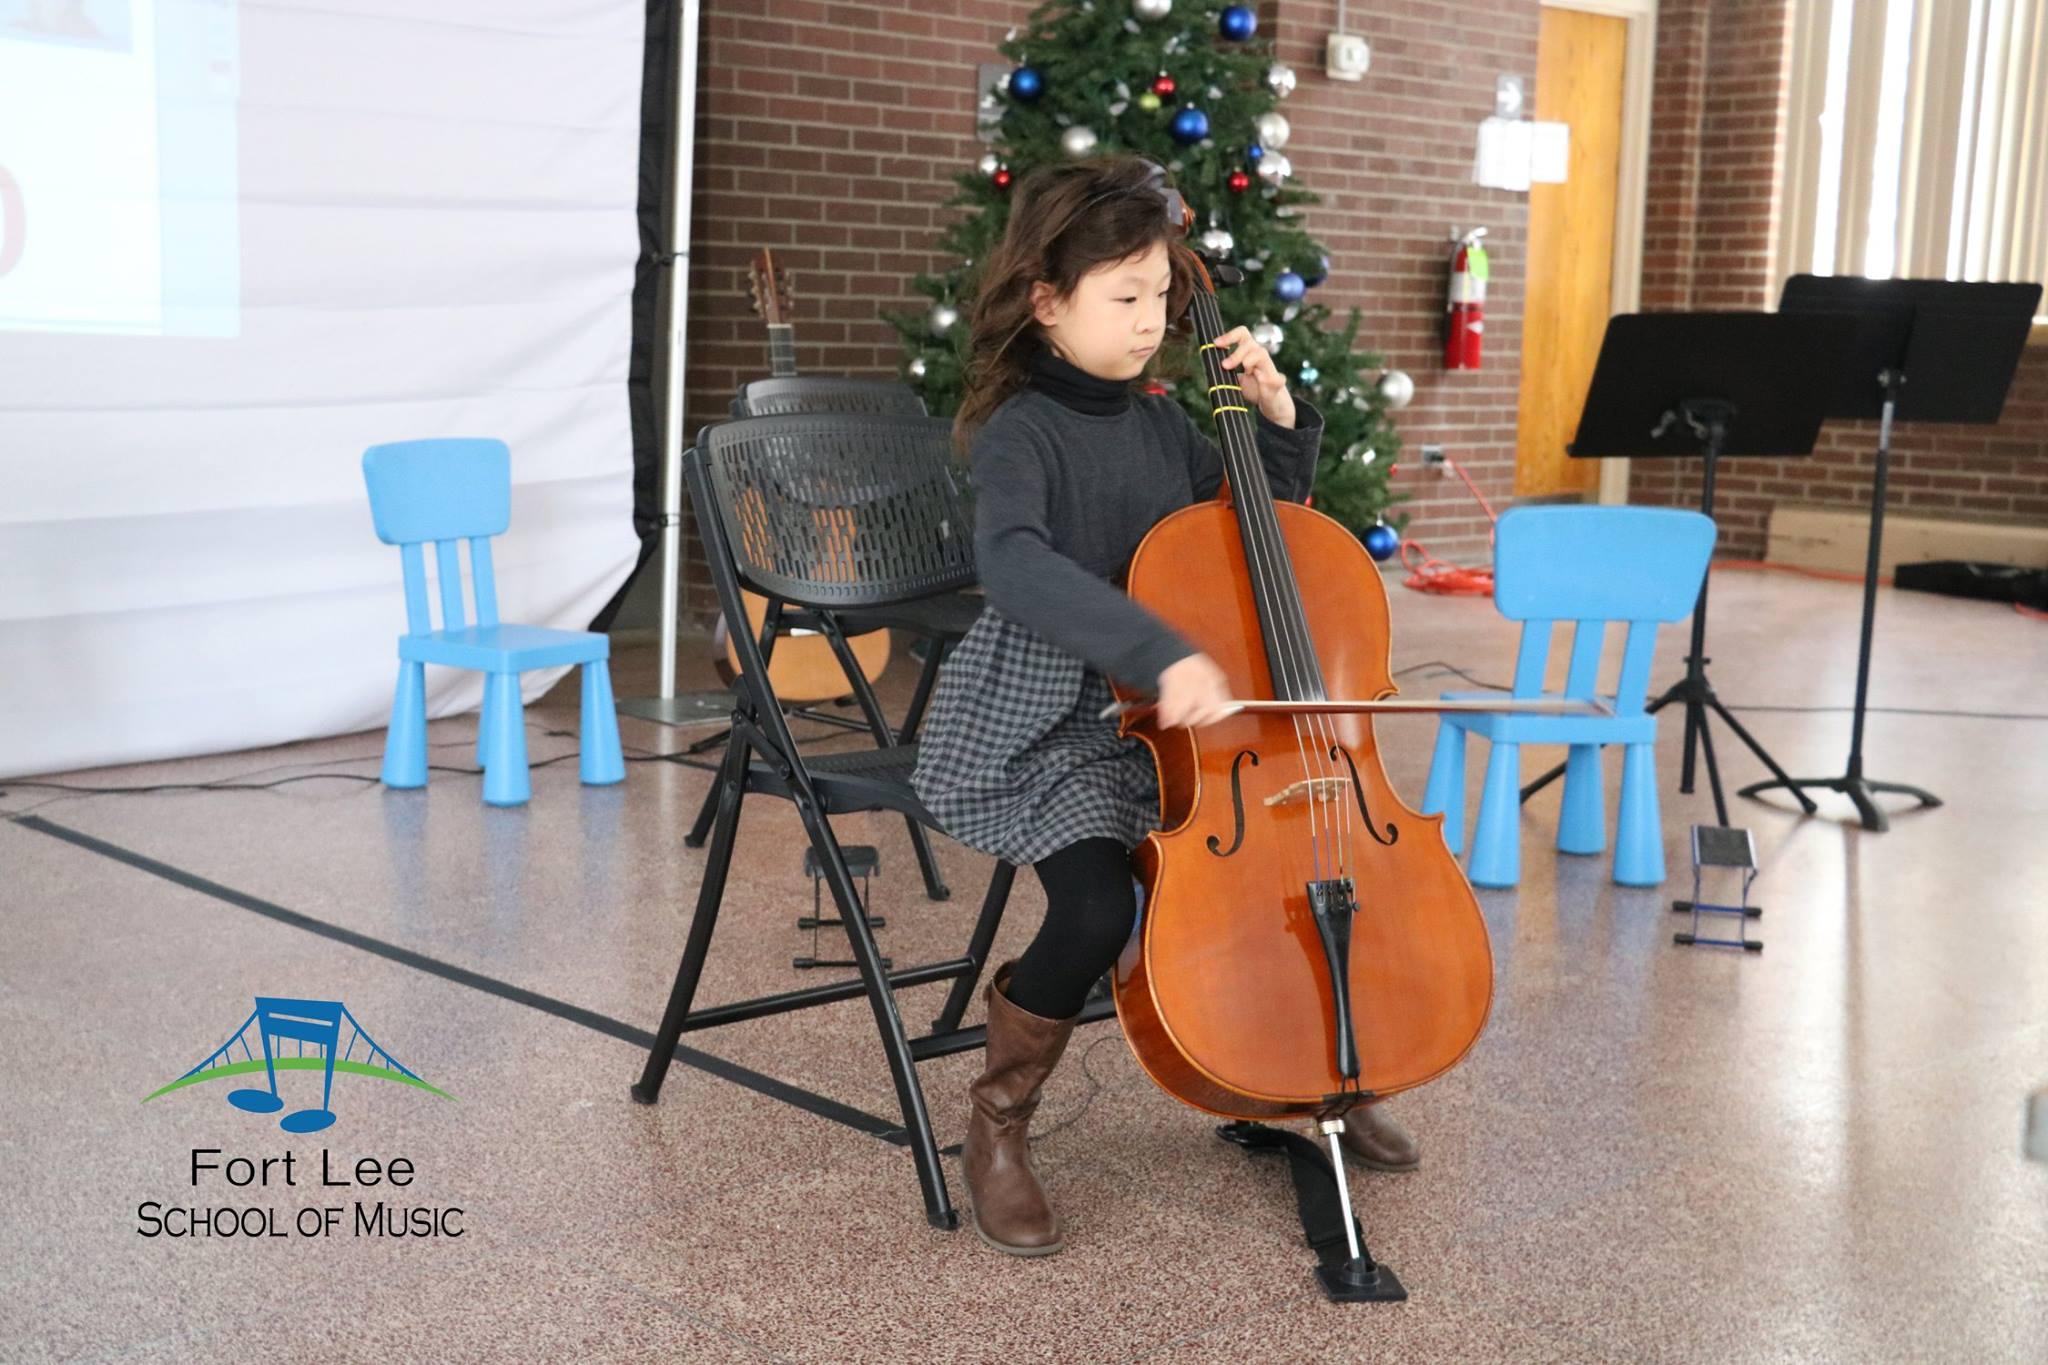 let-it-go-cello-fort-lee.jpg